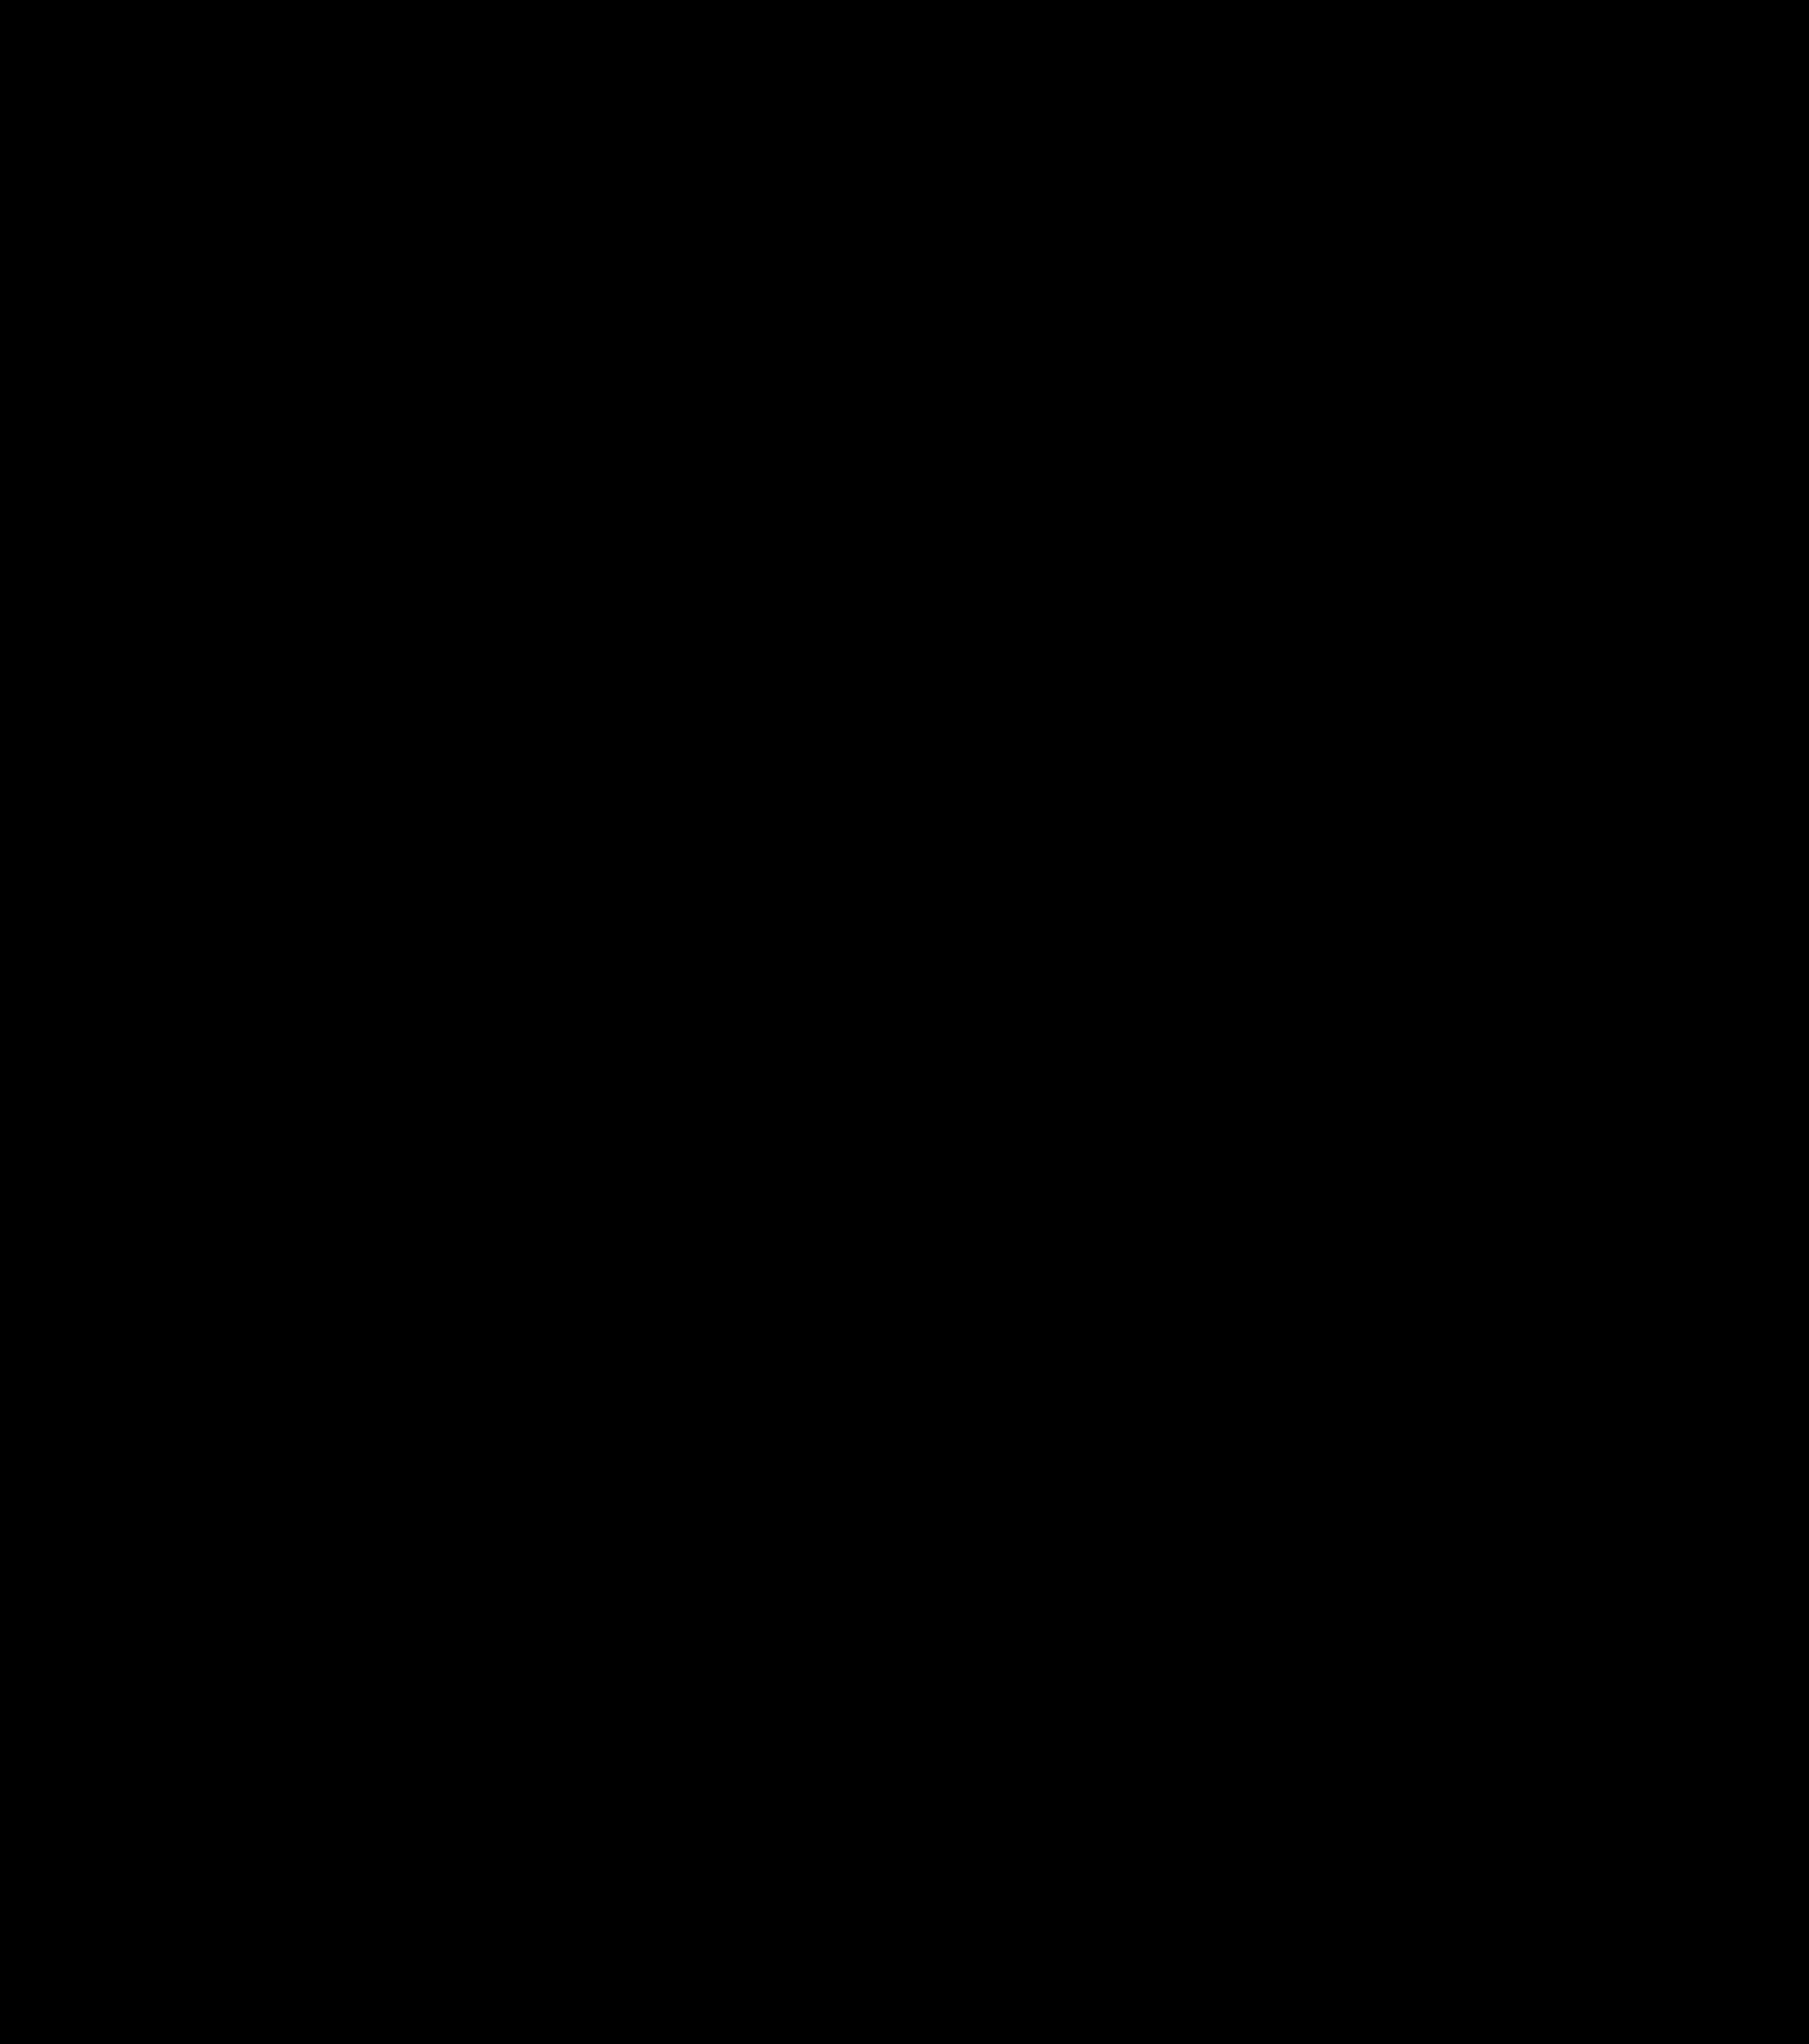 Clipart Chinese Wedding Symbol